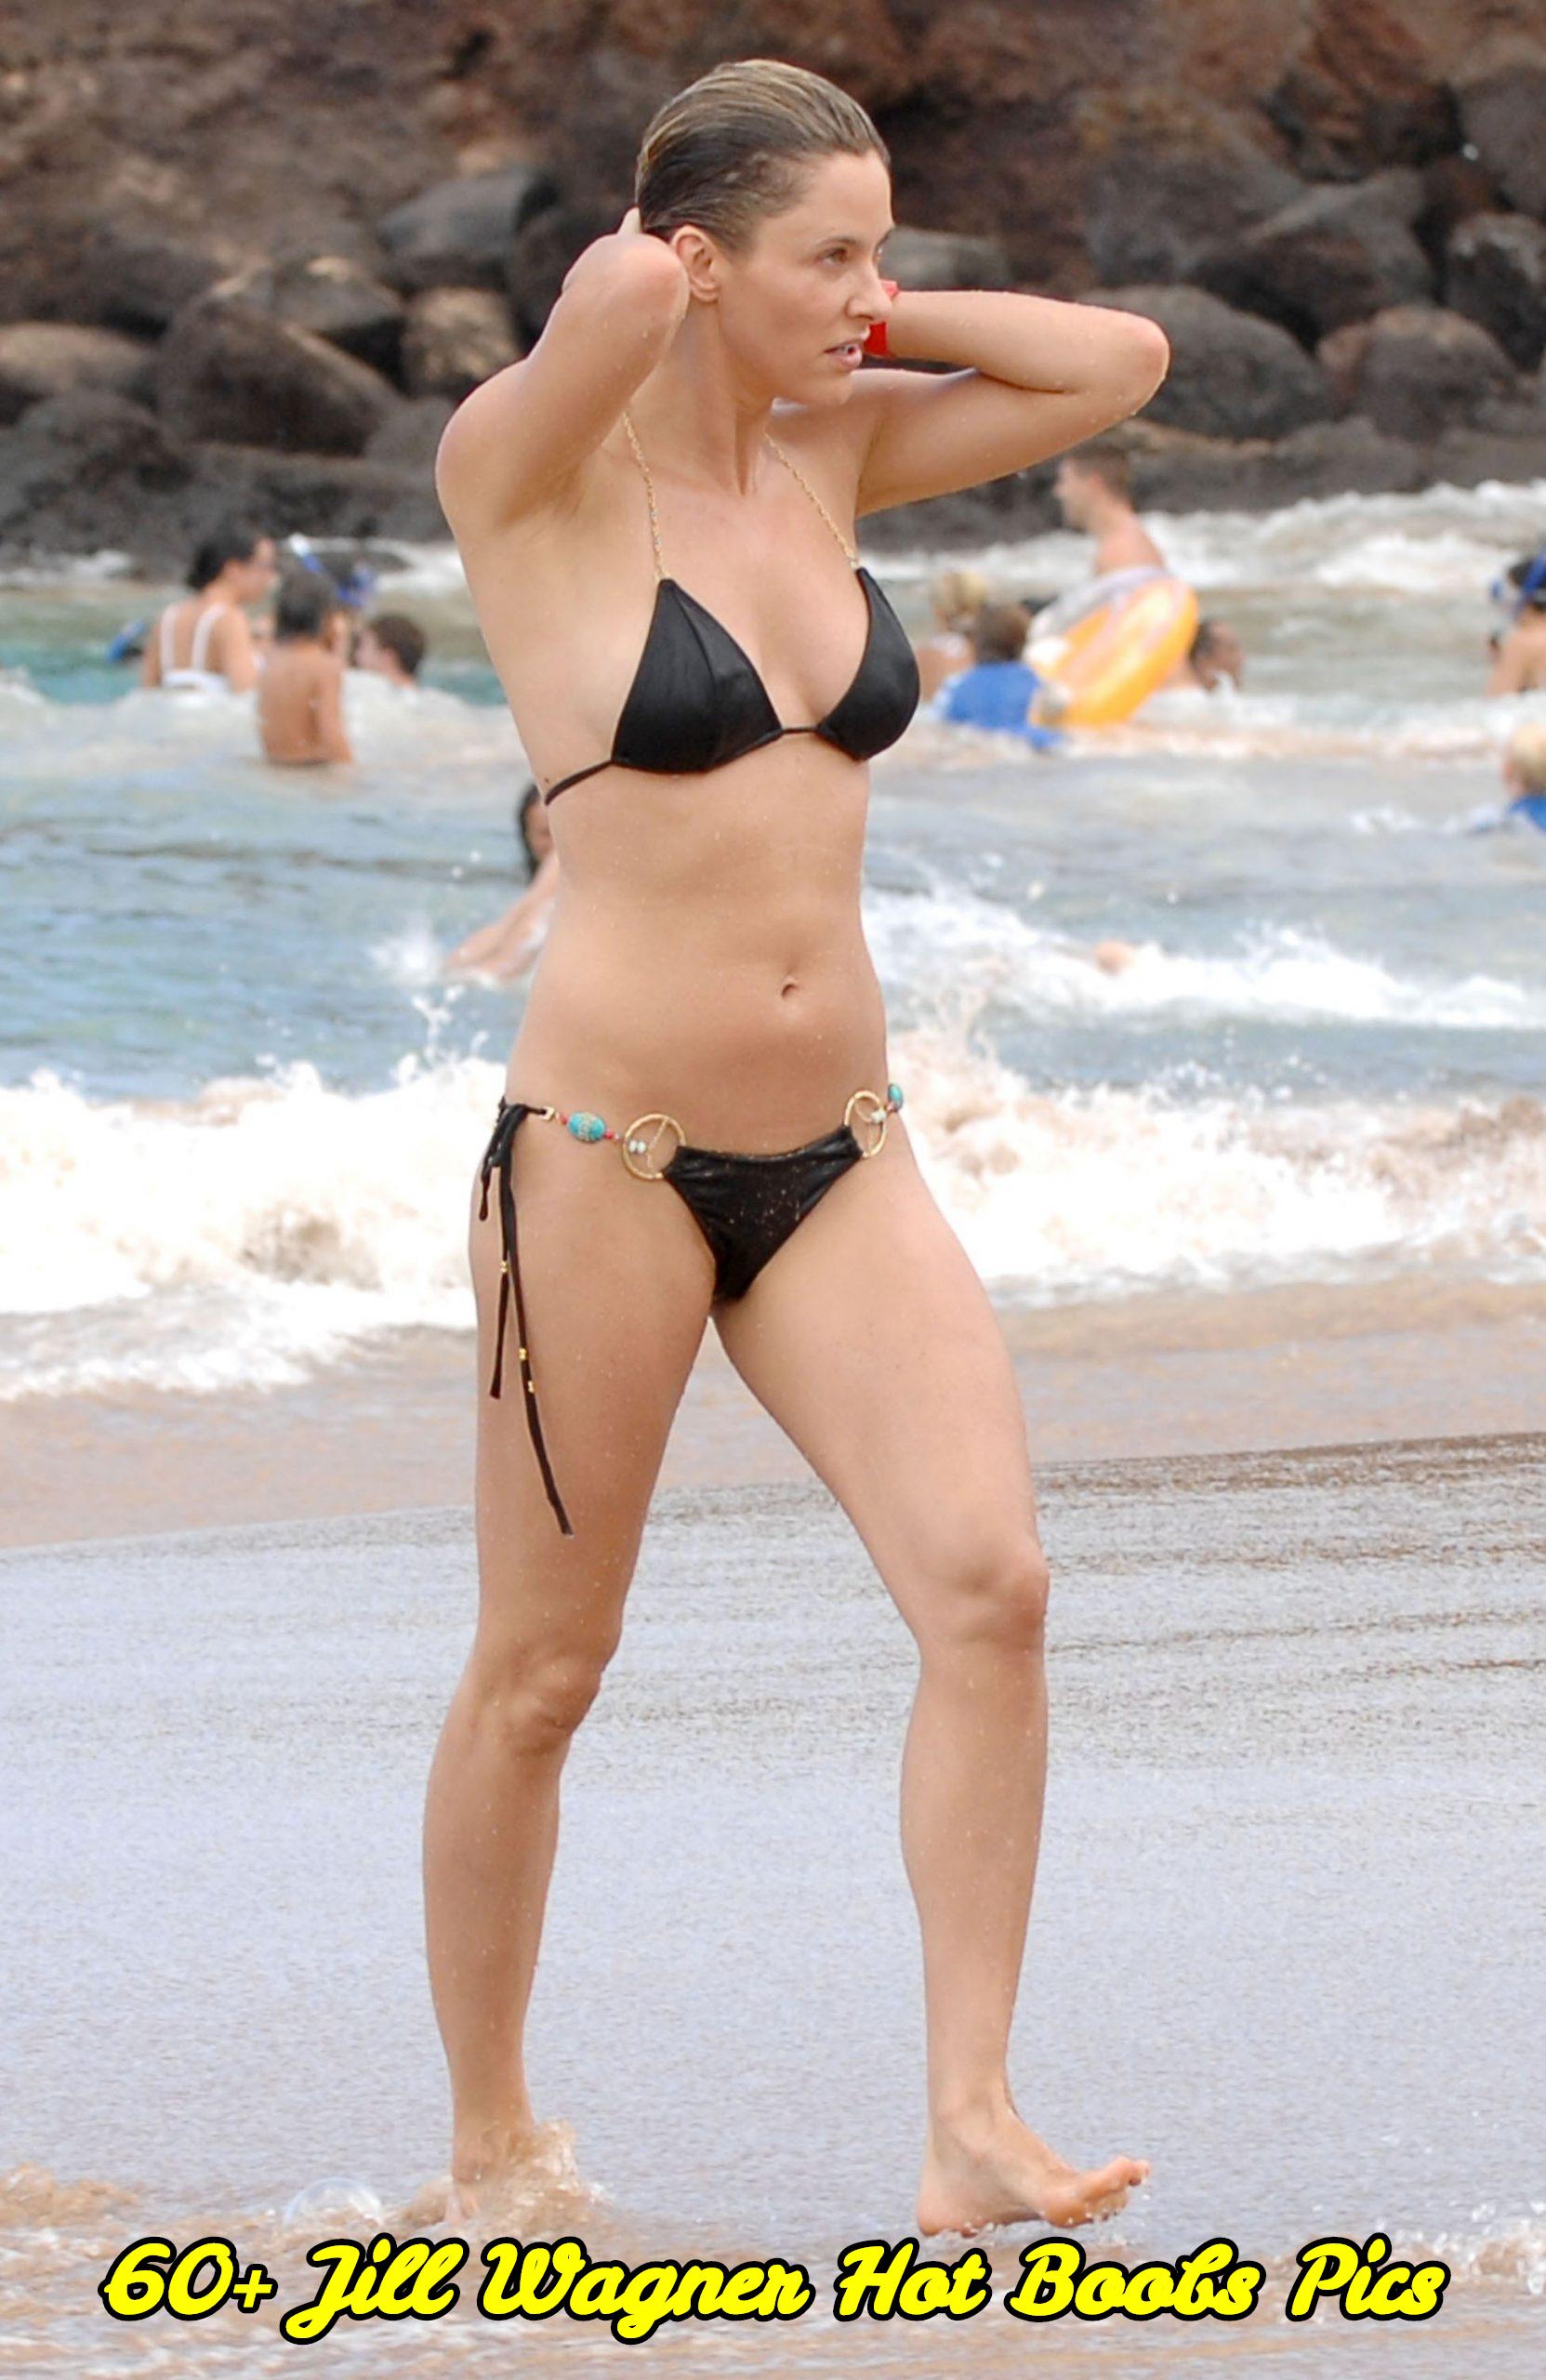 Jill Wagner hot boobs pics